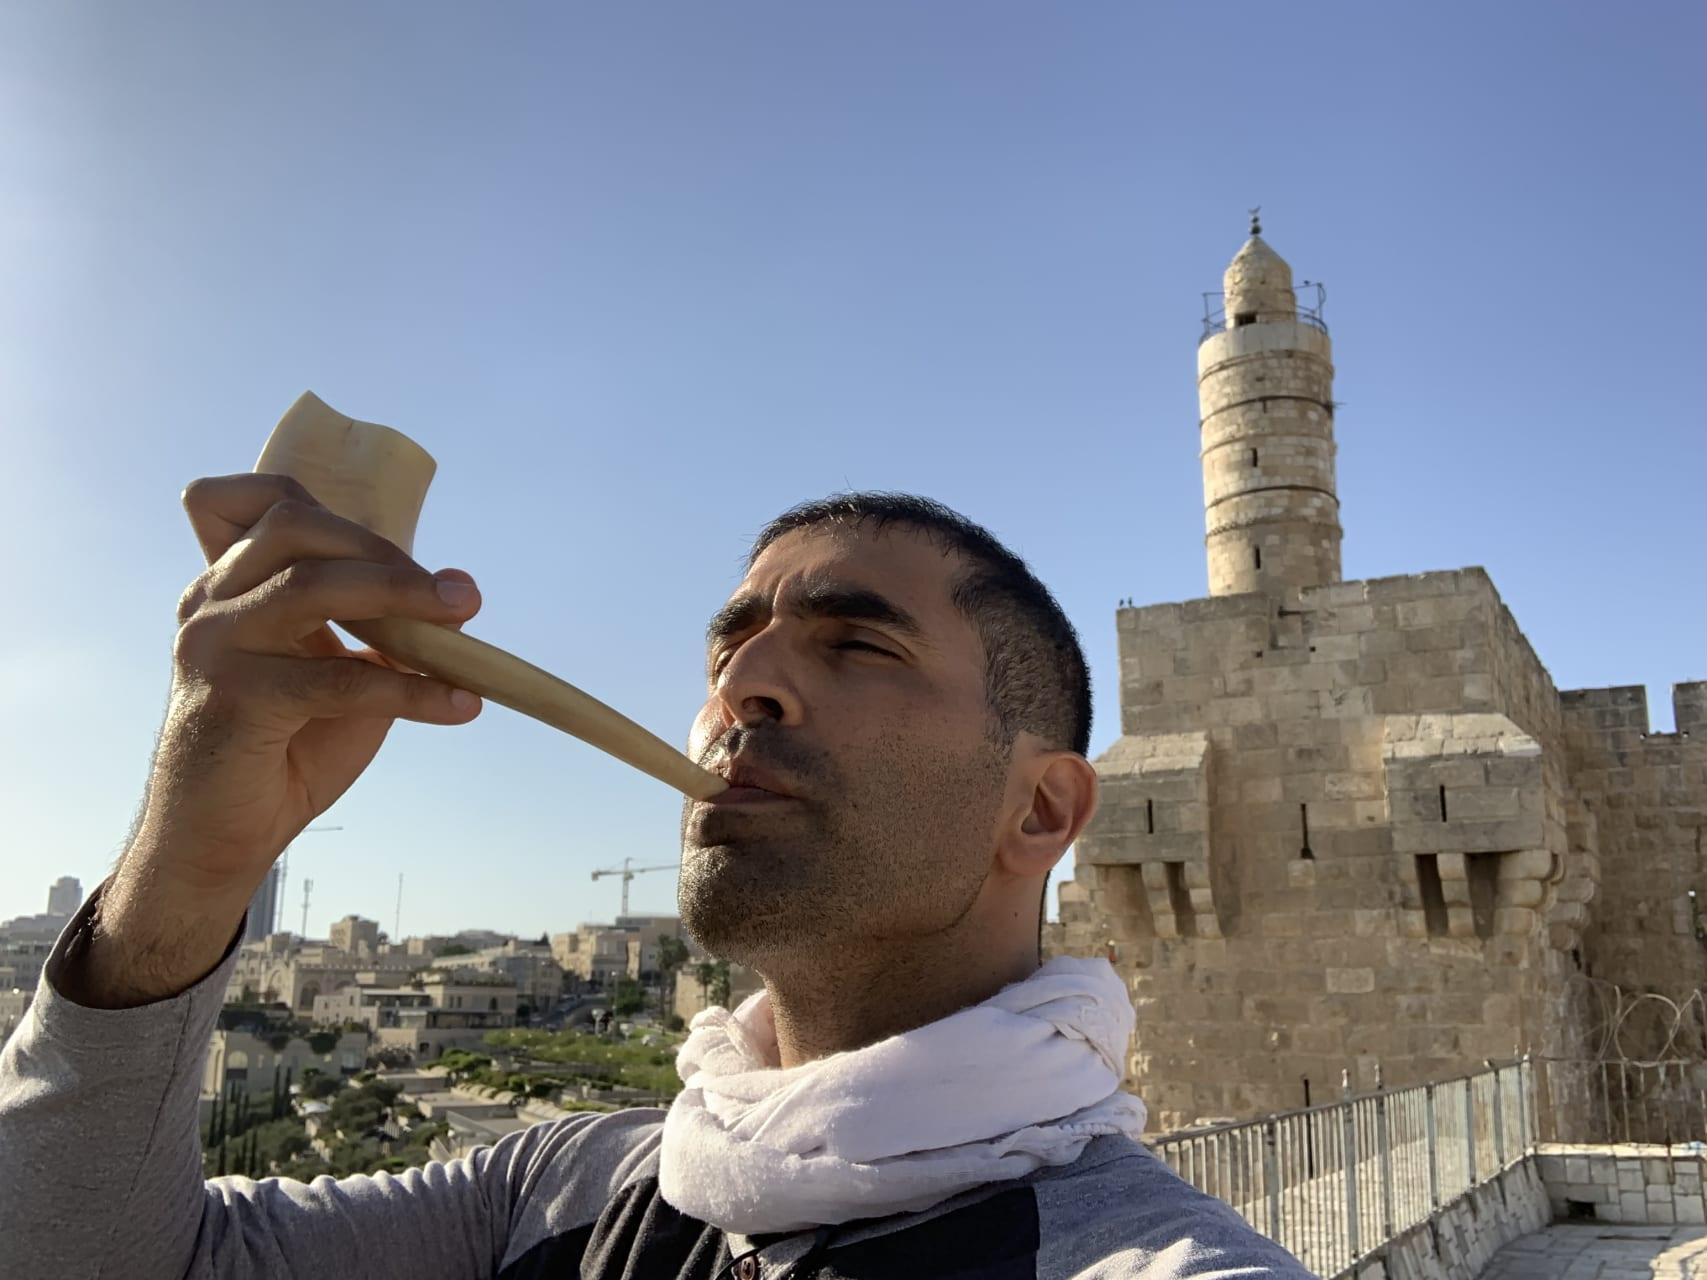 Jerusalem - Special Multi-Faith Prayer Session from Jerusalem for Rosh Hashanah